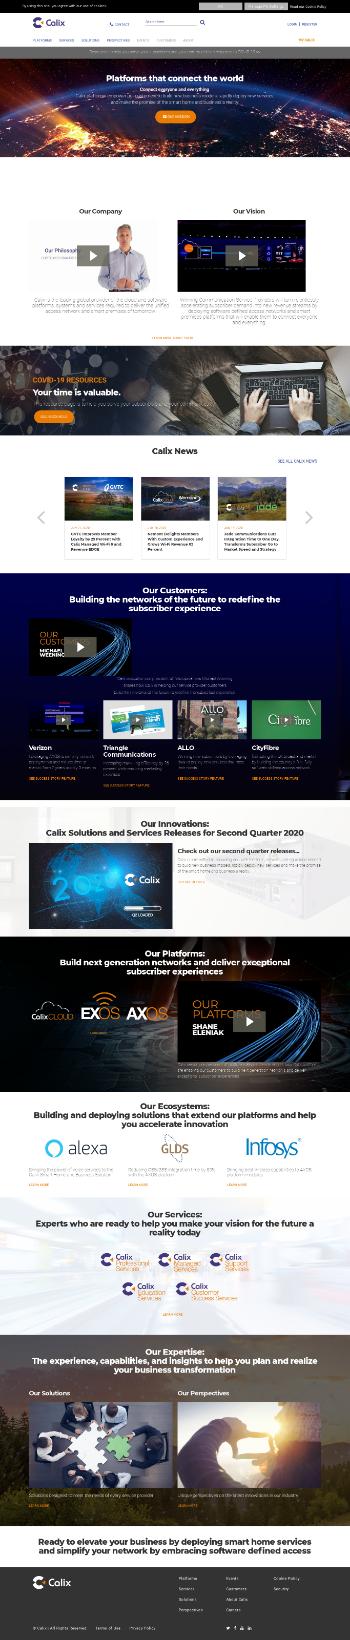 Calix, Inc. Website Screenshot